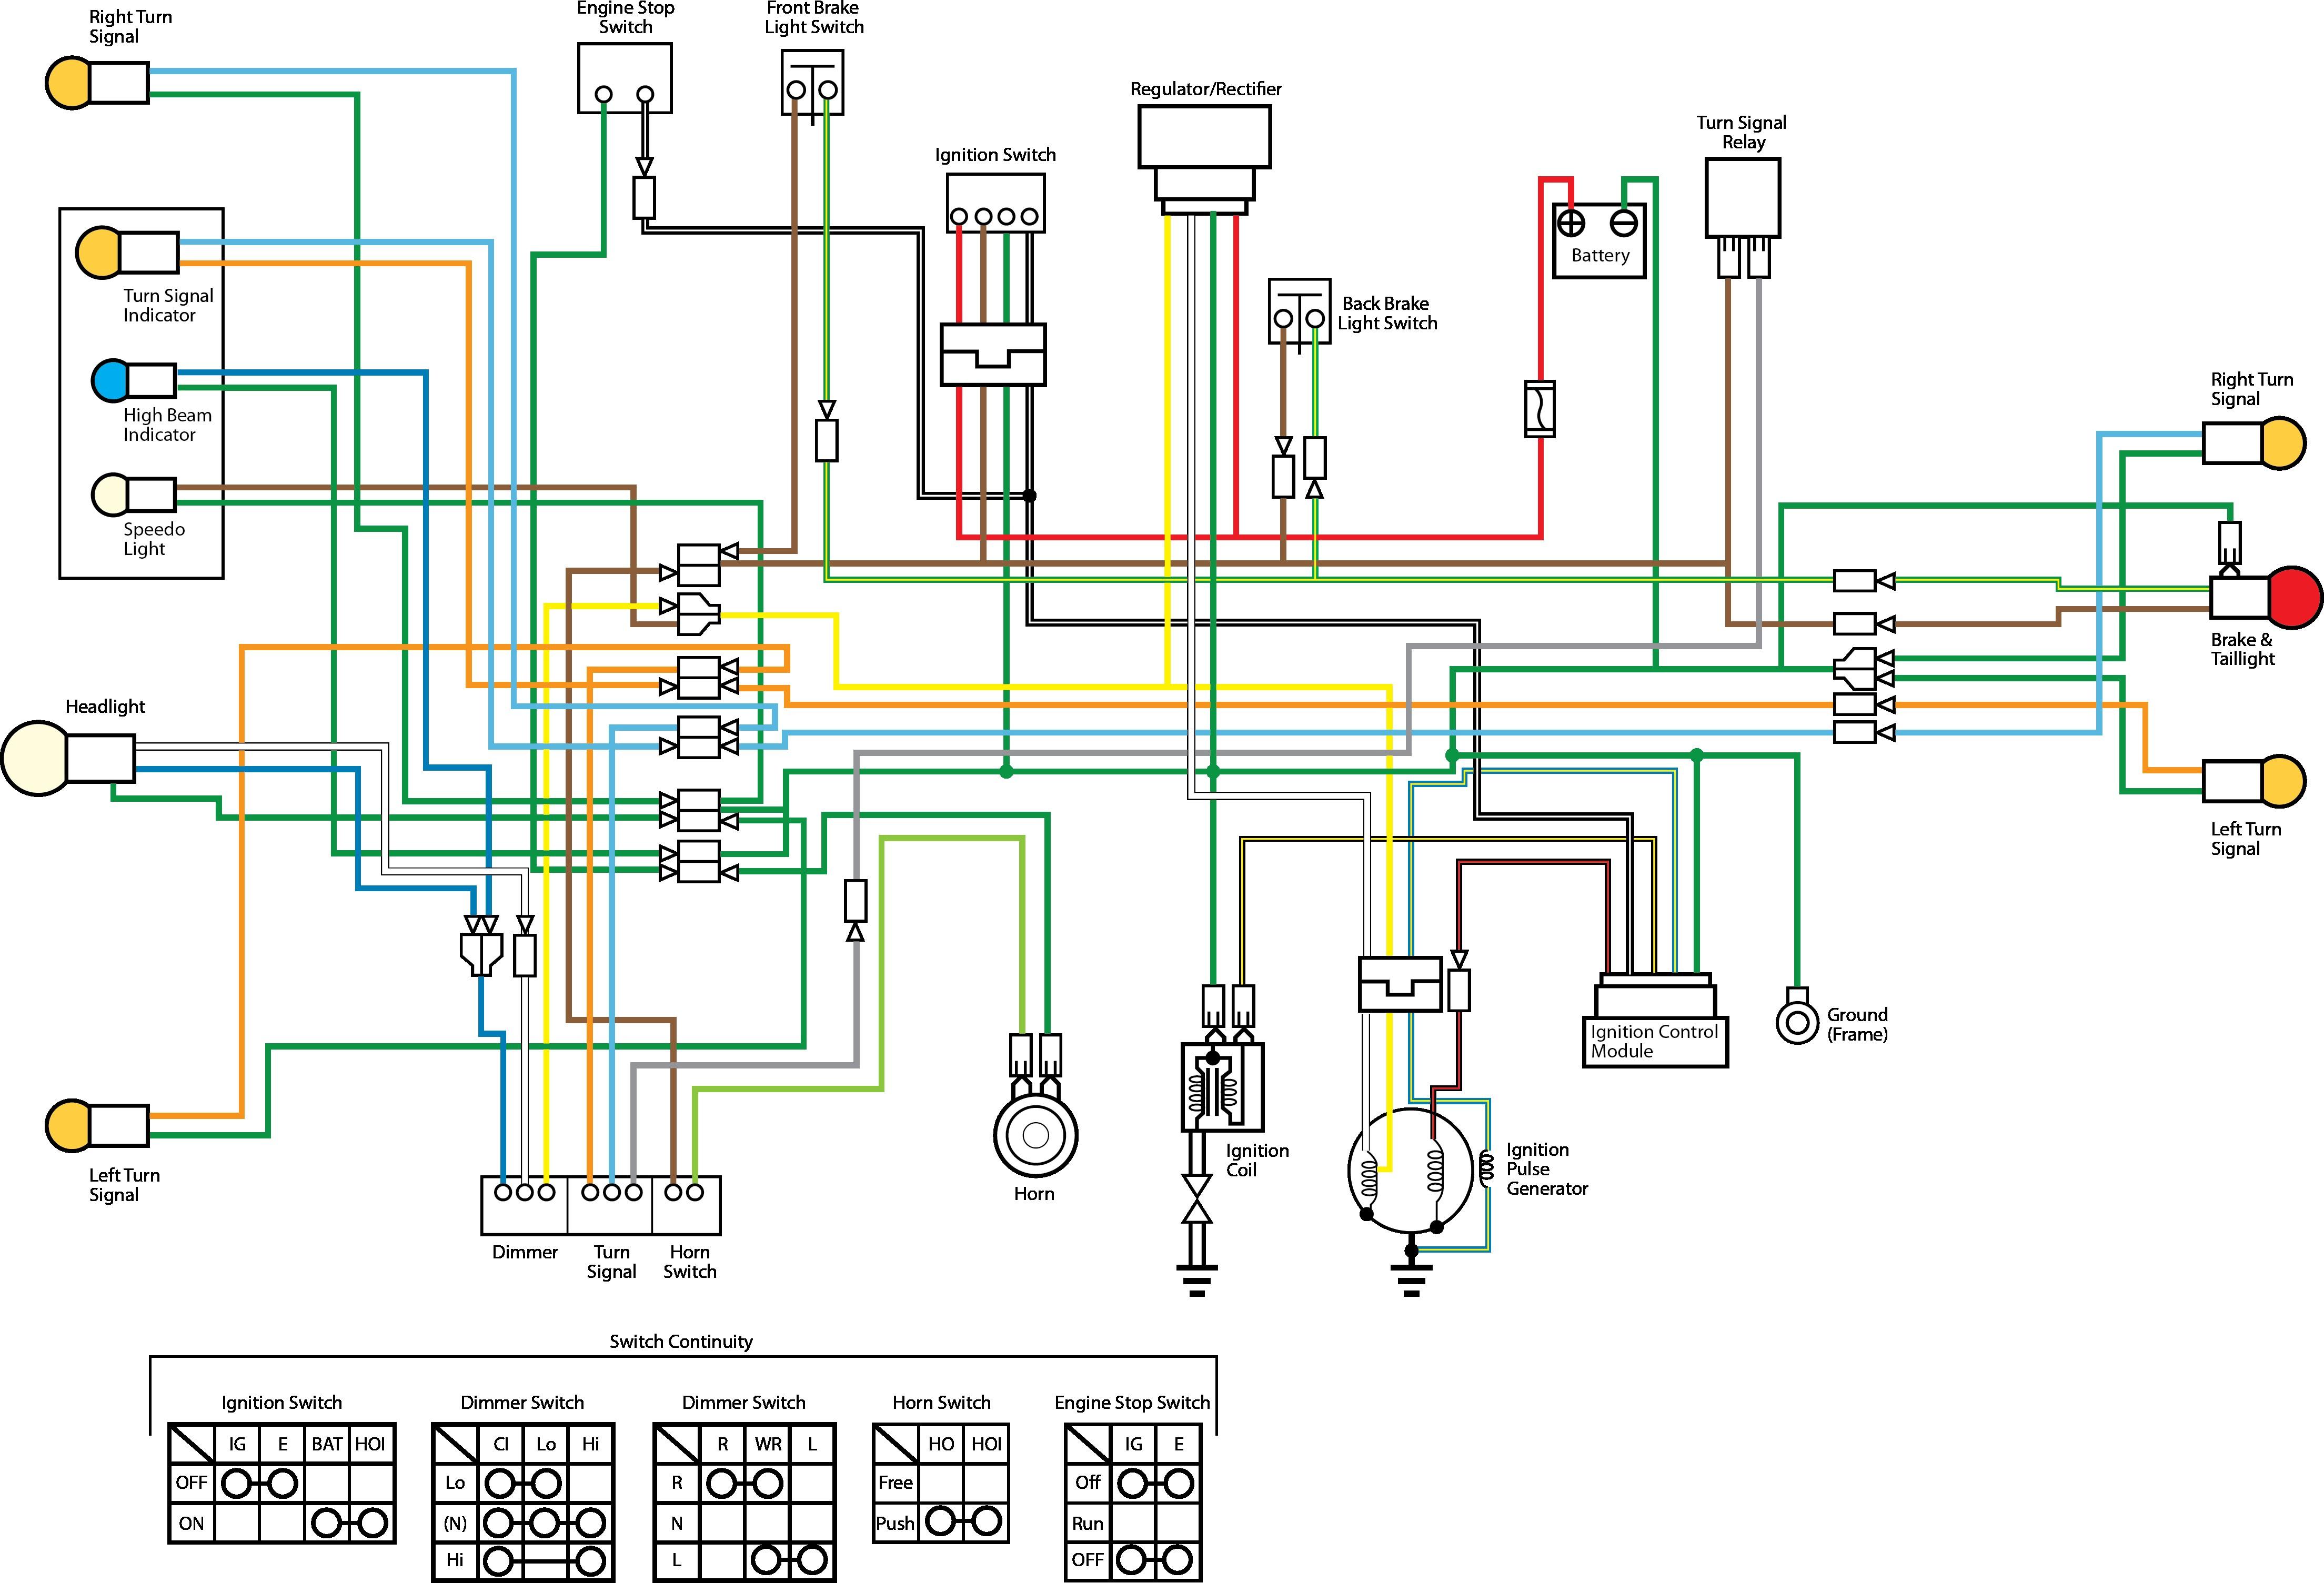 Crf450x Wire Diagram - 1995 Ford Ranger Under Dash Wiring Diagram -  2006cruisers.tukune.jeanjaures37.fr | 2015 Crf450x Wiring Diagram |  | Wiring Diagram Resource